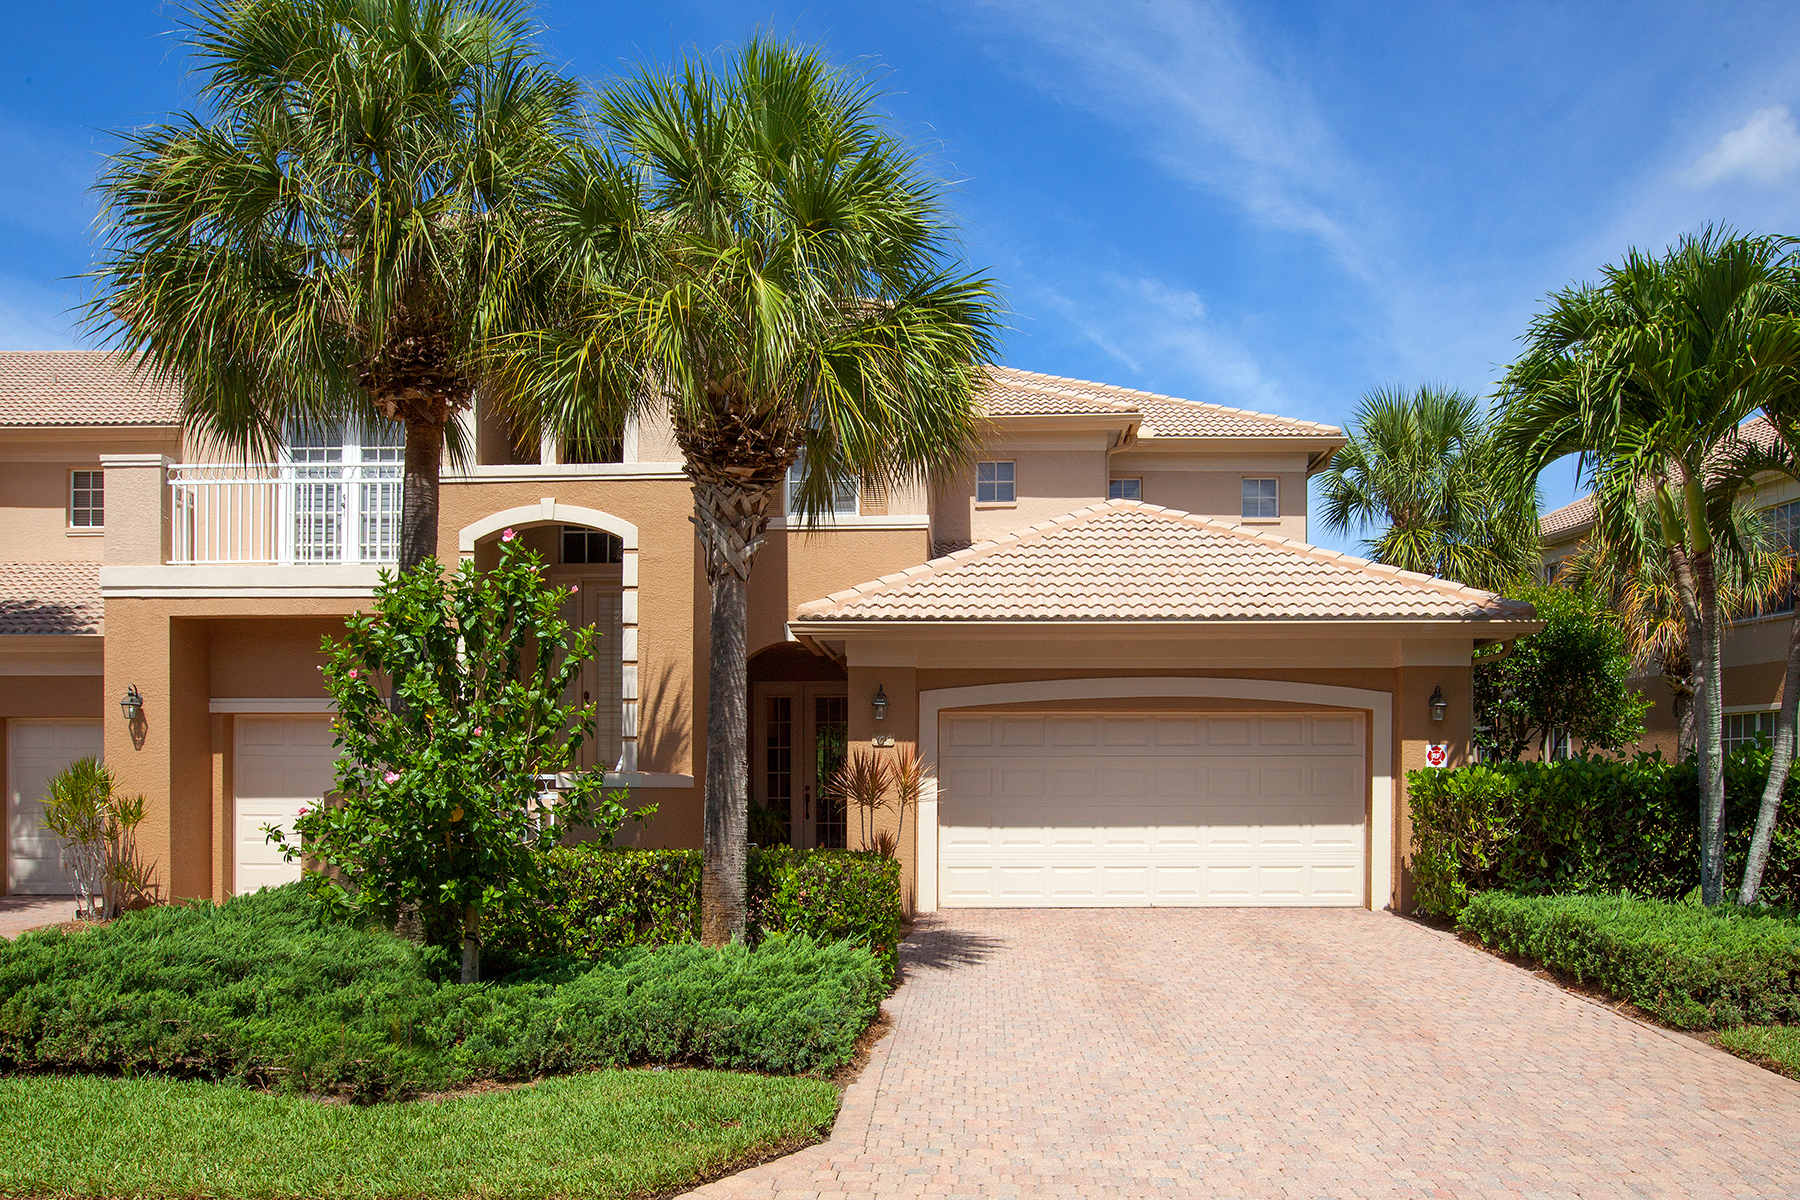 Appartement en copropriété pour l Vente à THE COLONY AT PELICAN BAY - MERANO 23810 Merano Ct 102 Bonita Springs, Florida 34134 États-Unis